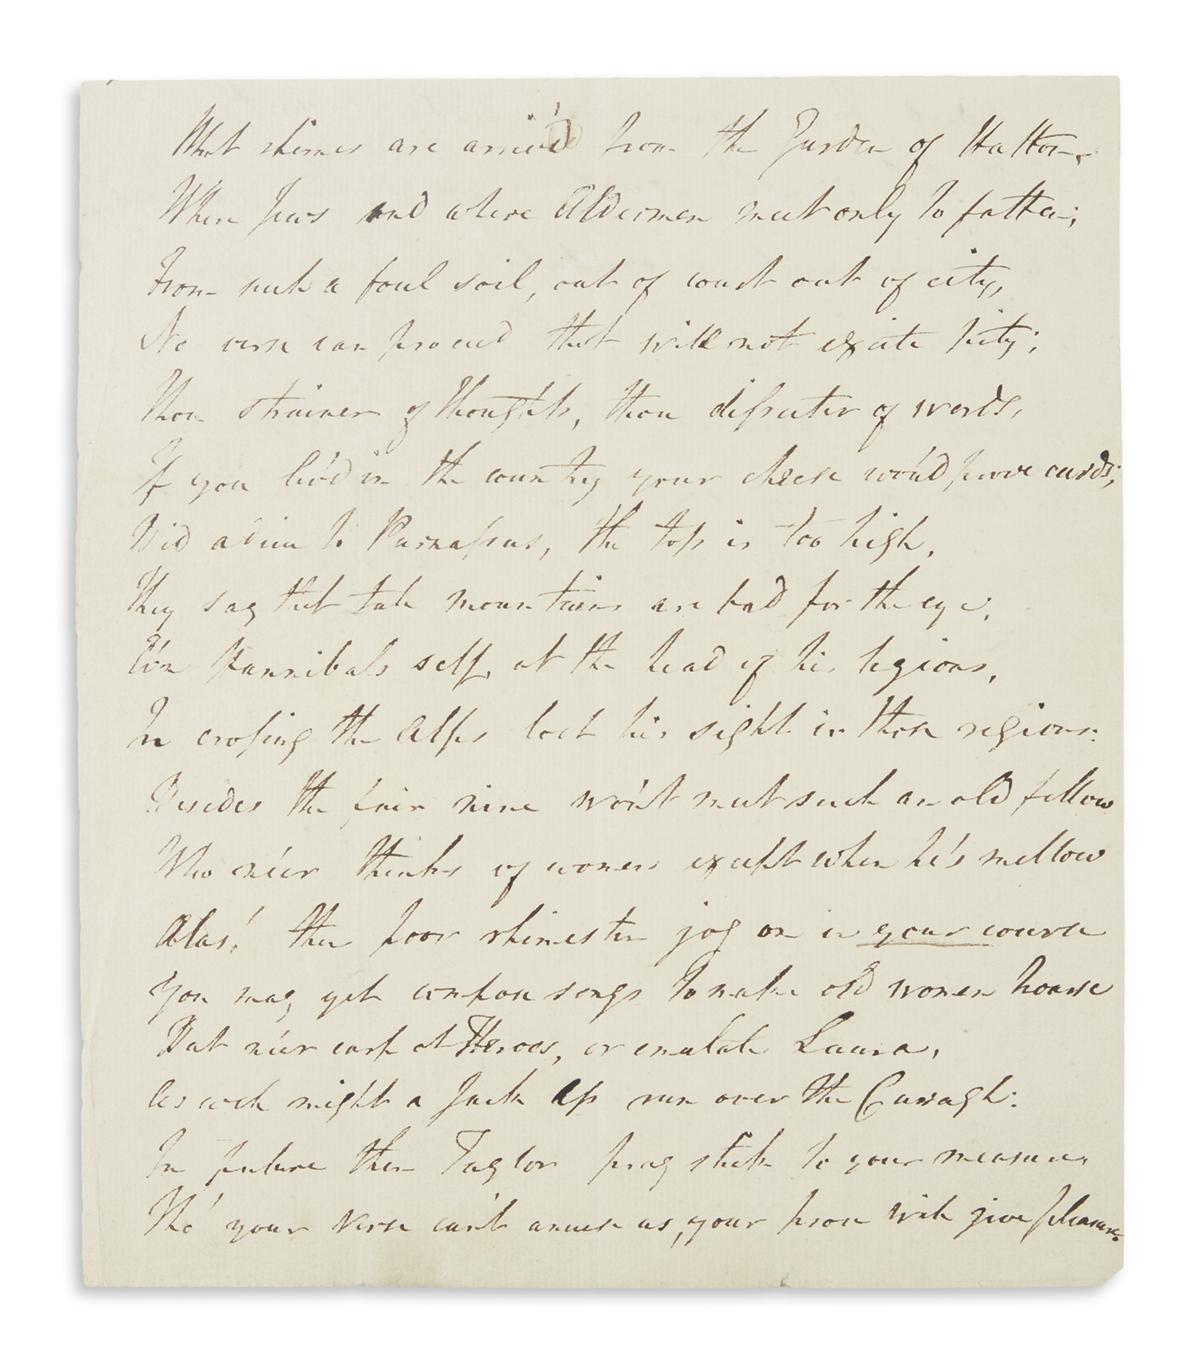 TARLETON, BANASTRE. Fragment of an Autograph Letter Signed, B.T., to Juan[?] (lacking salutation),